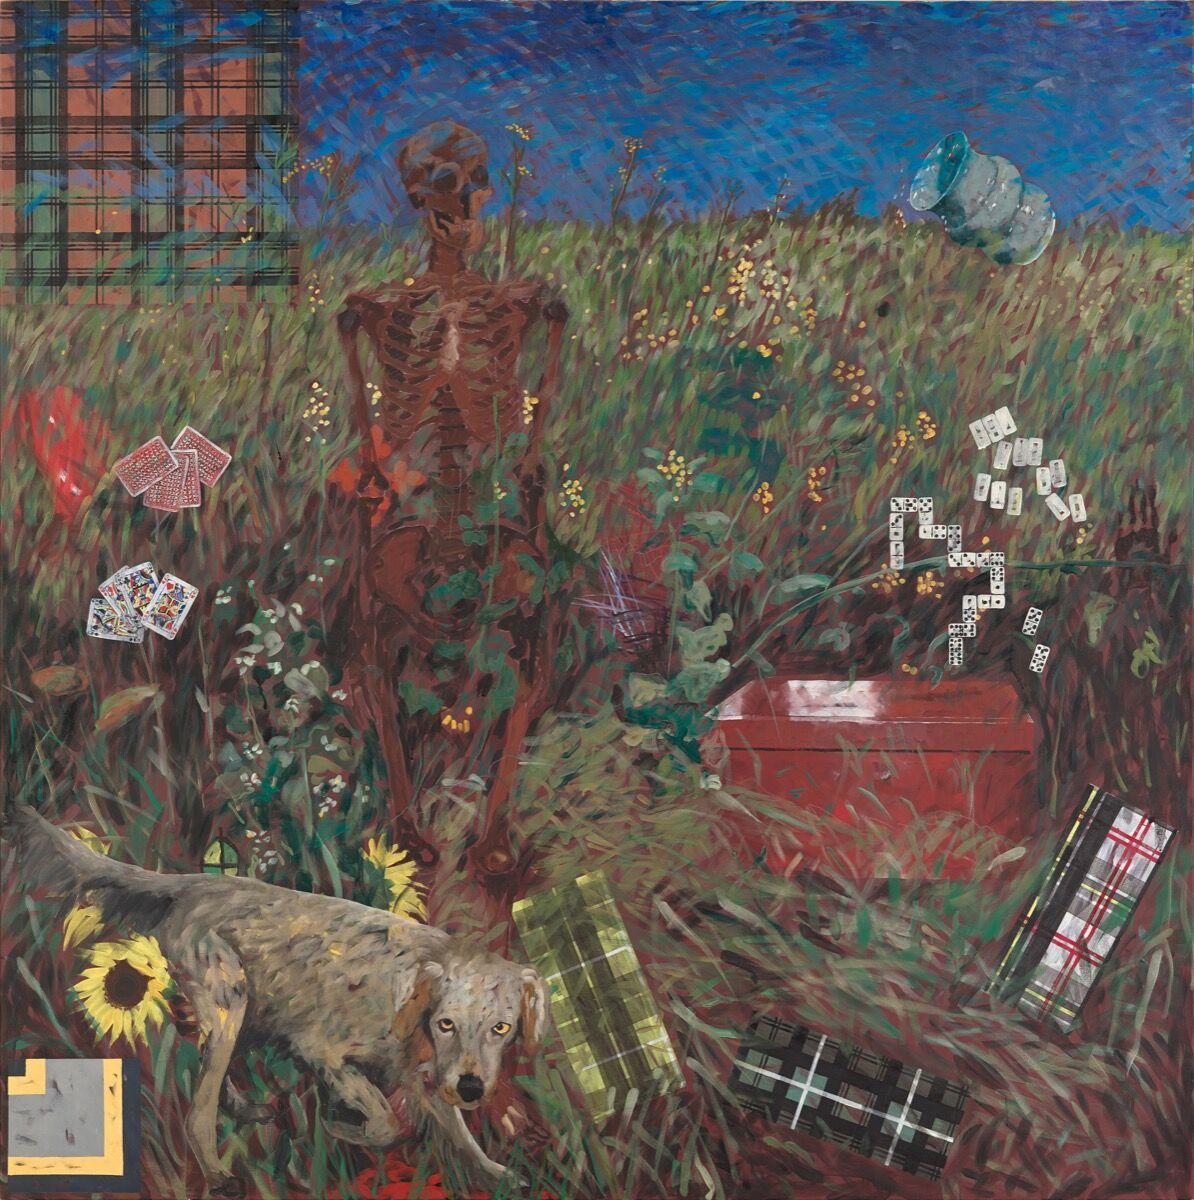 Jennifer Bartlett, Fall, 1990. Courtesy of the artist and Locks Gallery.